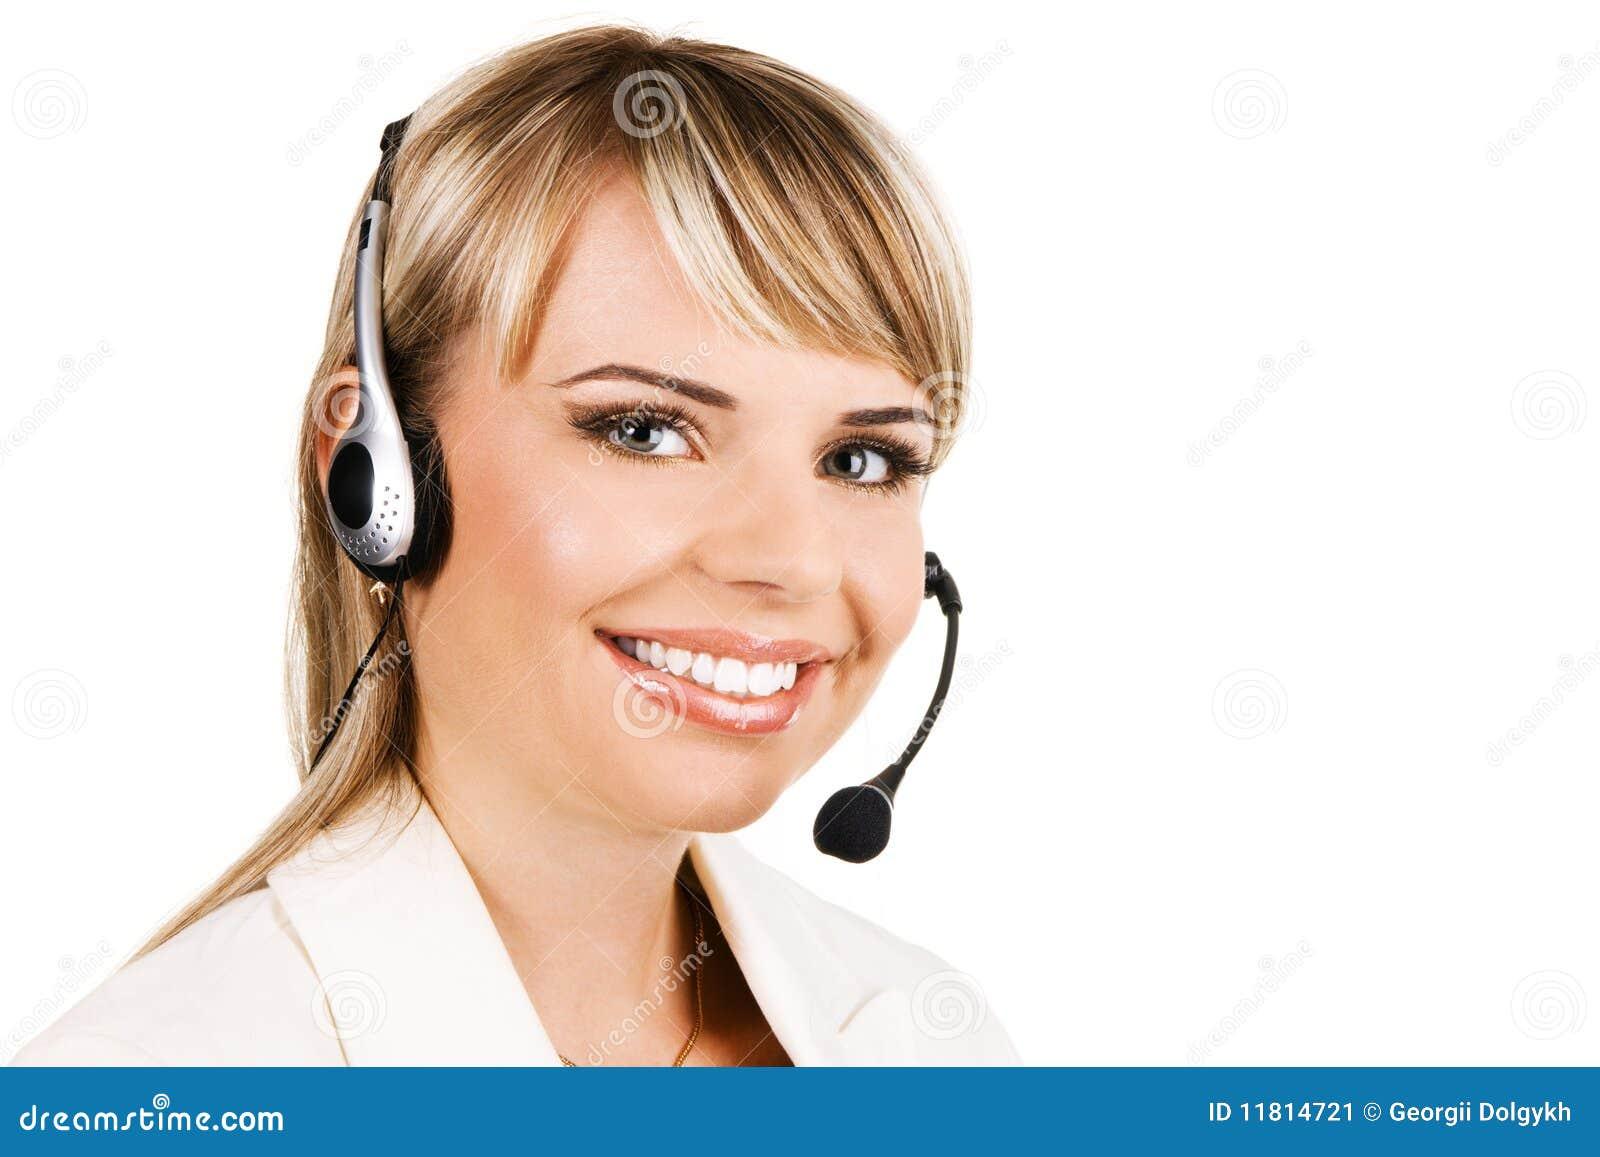 professional customer